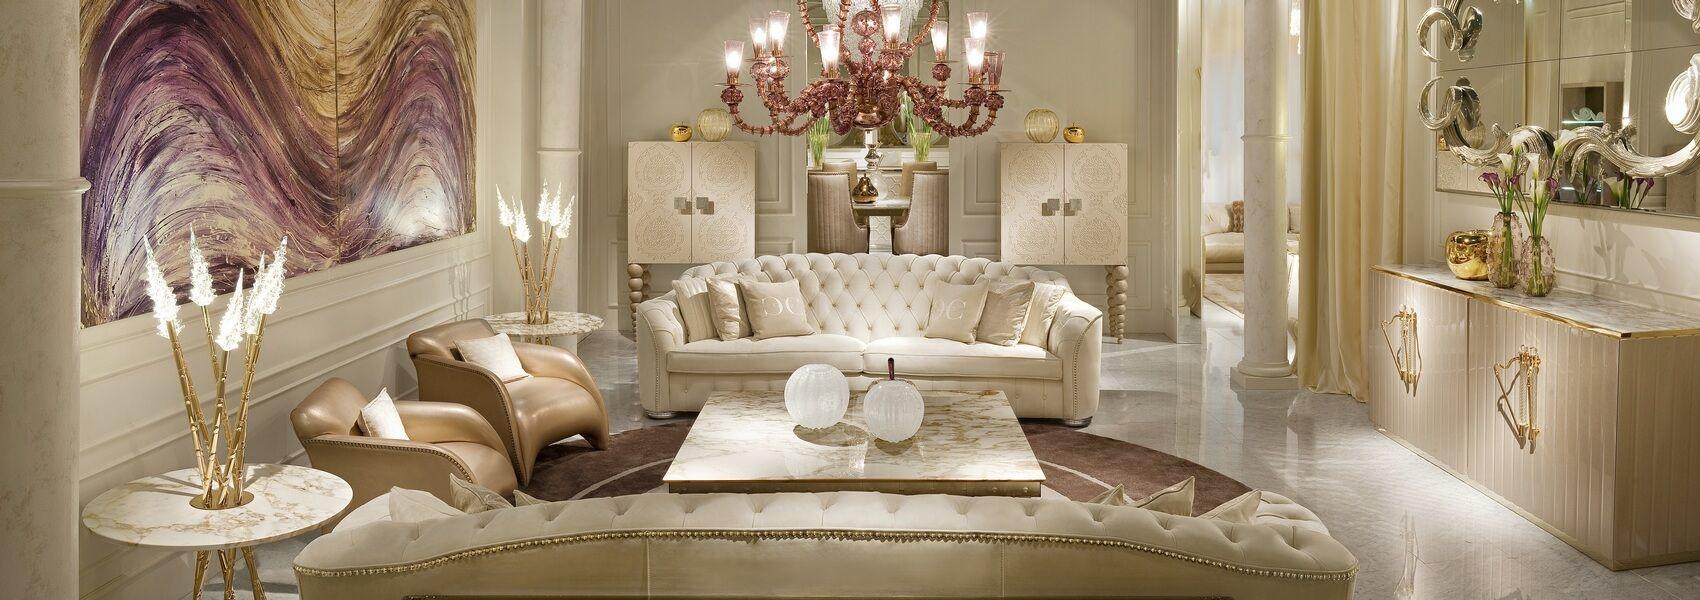 Elite Home Luxury Furniture Interiors In Miami New York